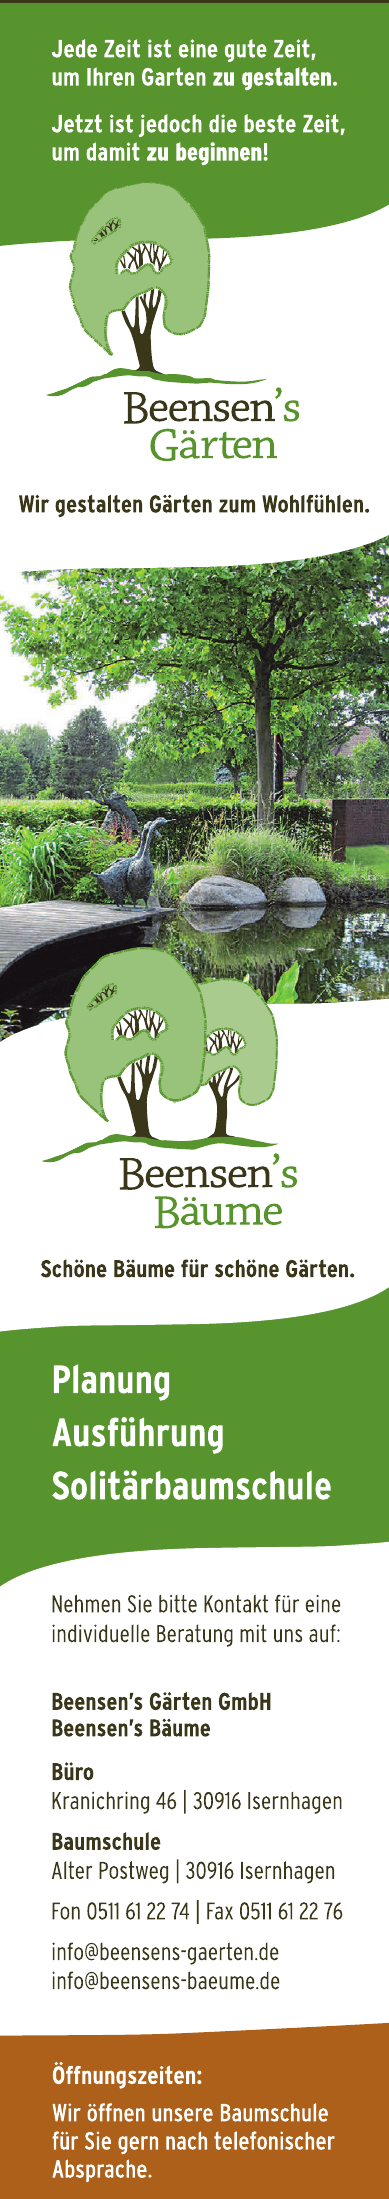 Beensen's Gärten GmbH  Beensen'sBäume